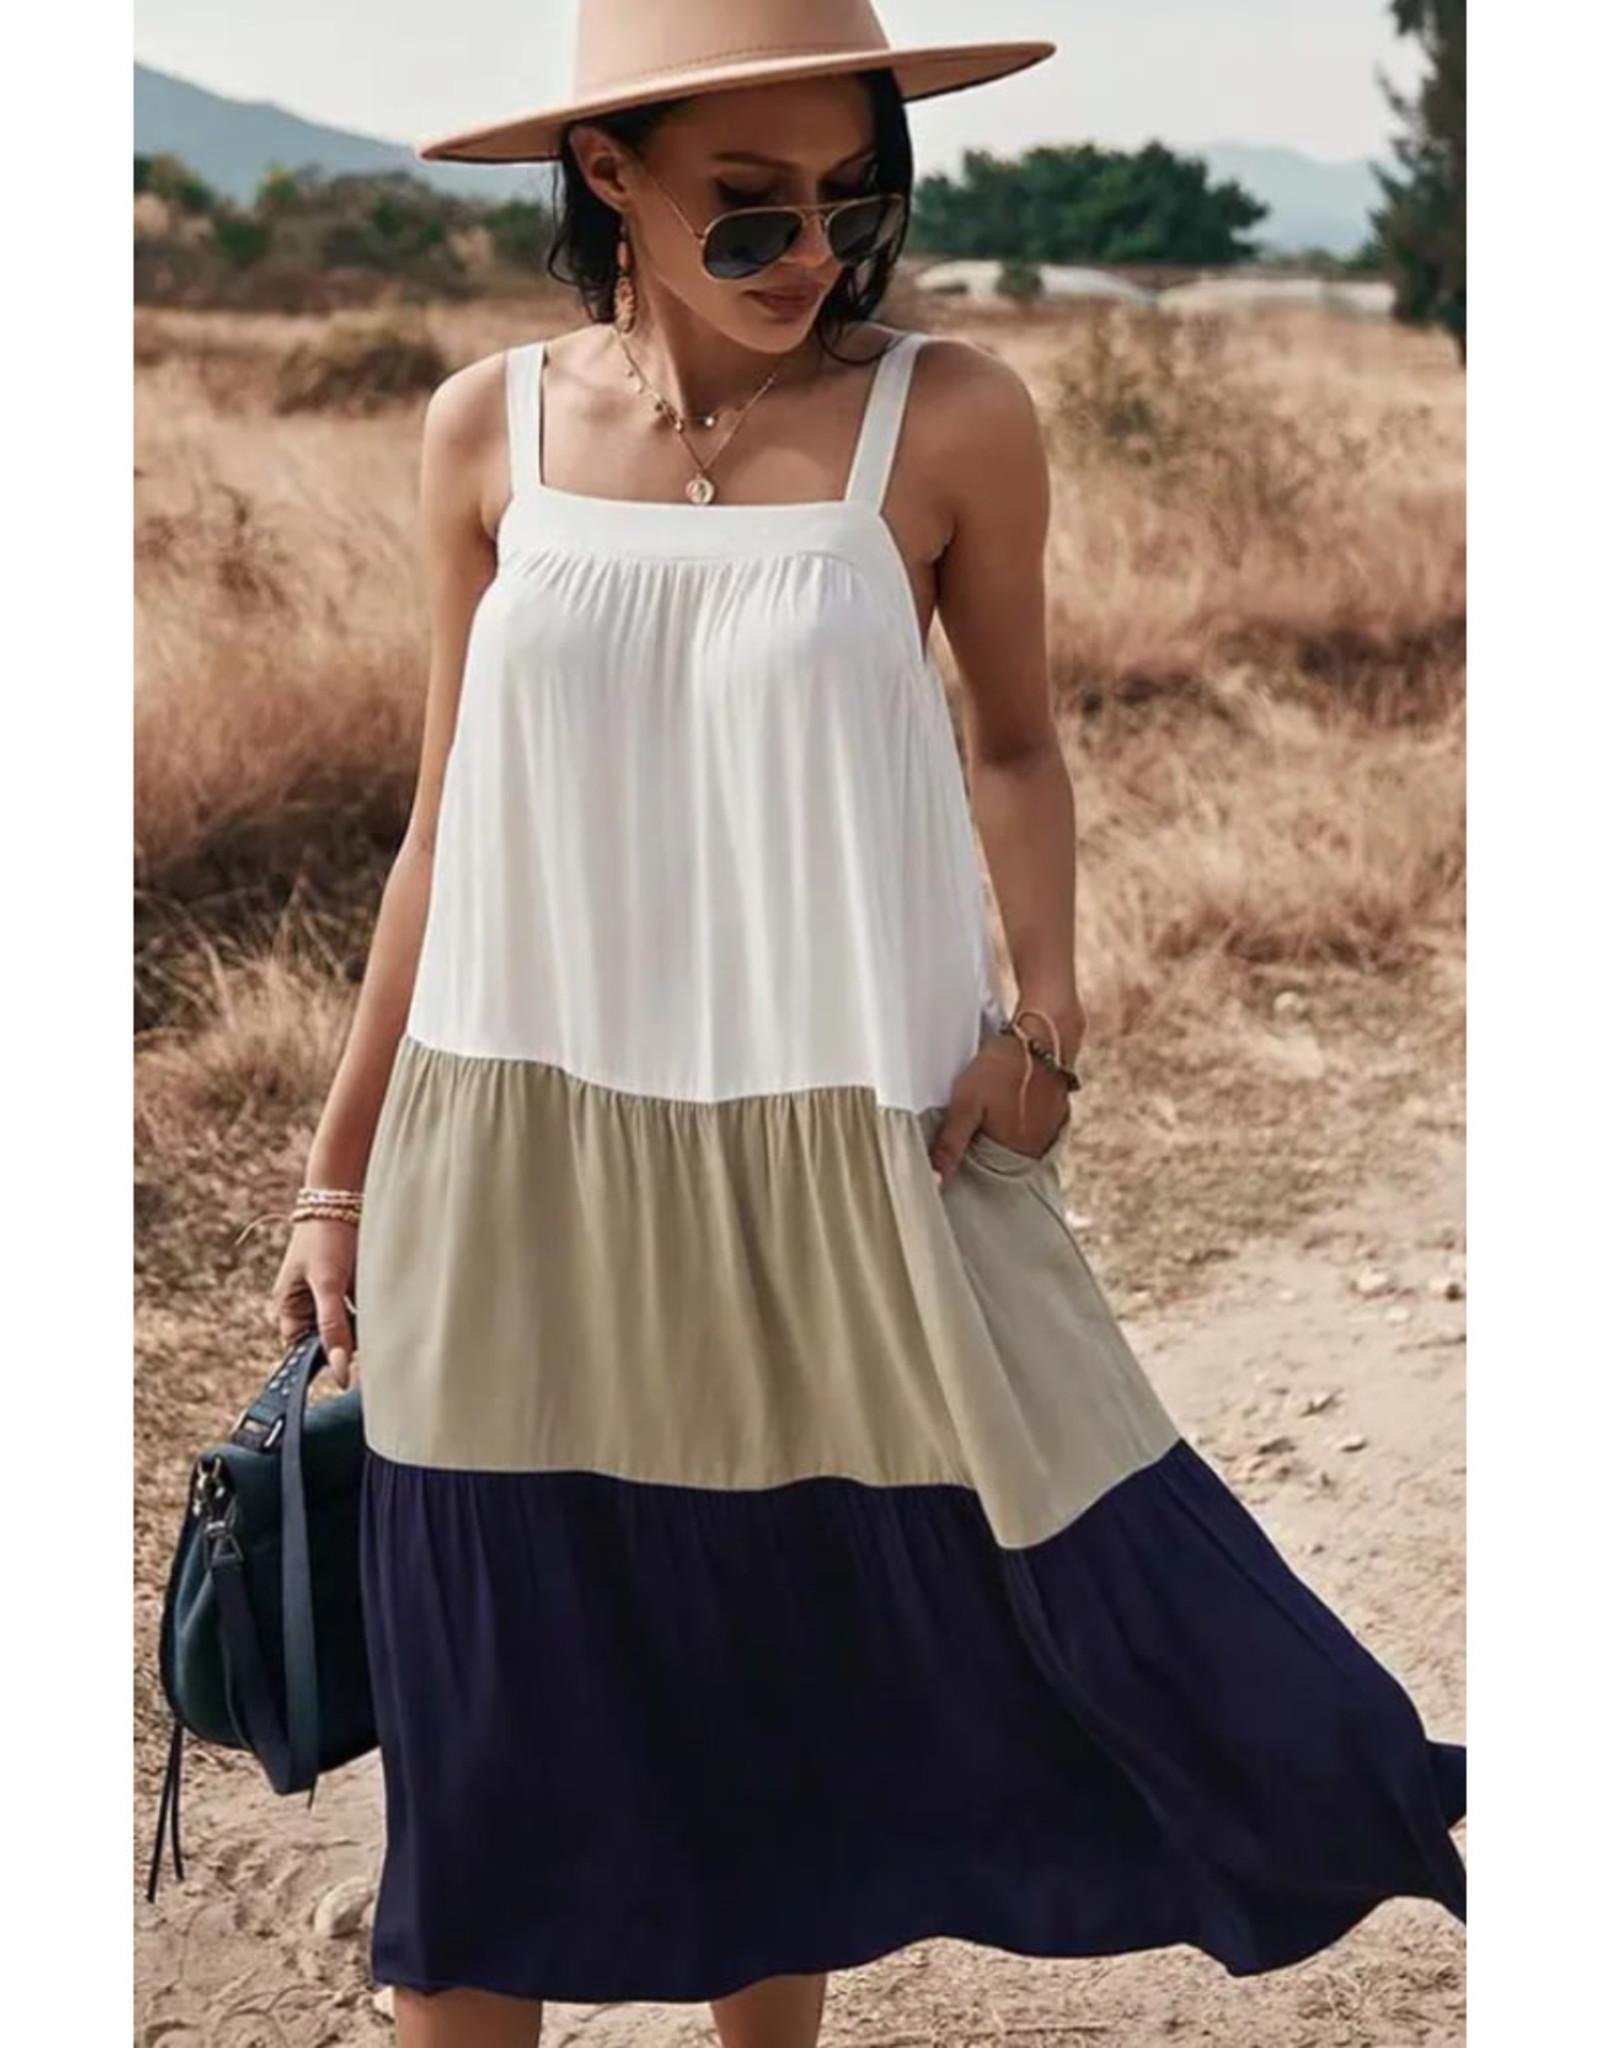 Tiered Colorblock Ruffle Midi Dress - Navy